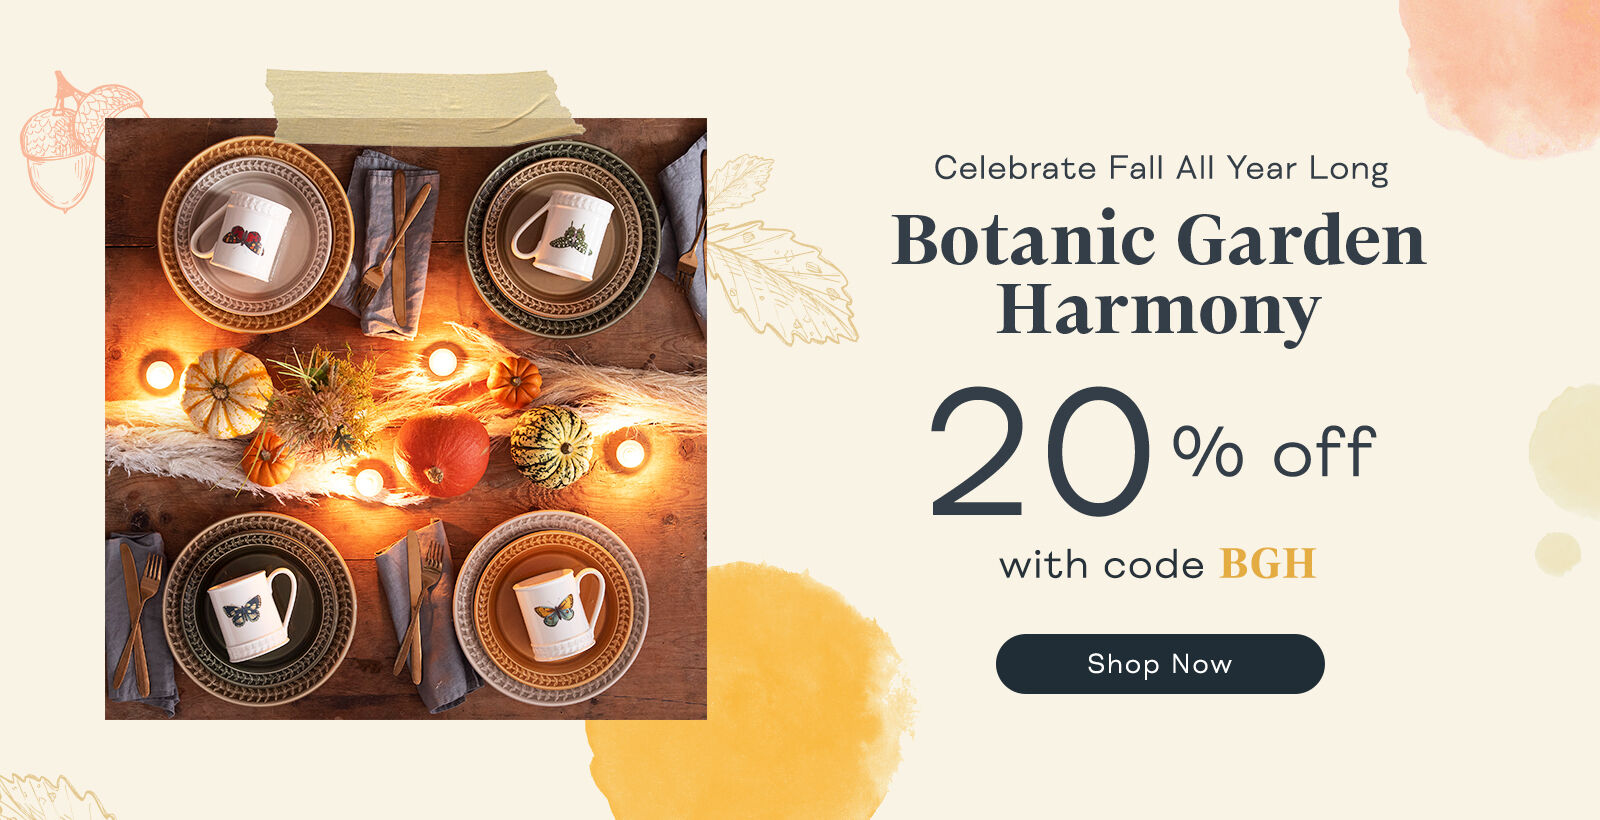 20% Off Botanic Garden Harmony with code BGH